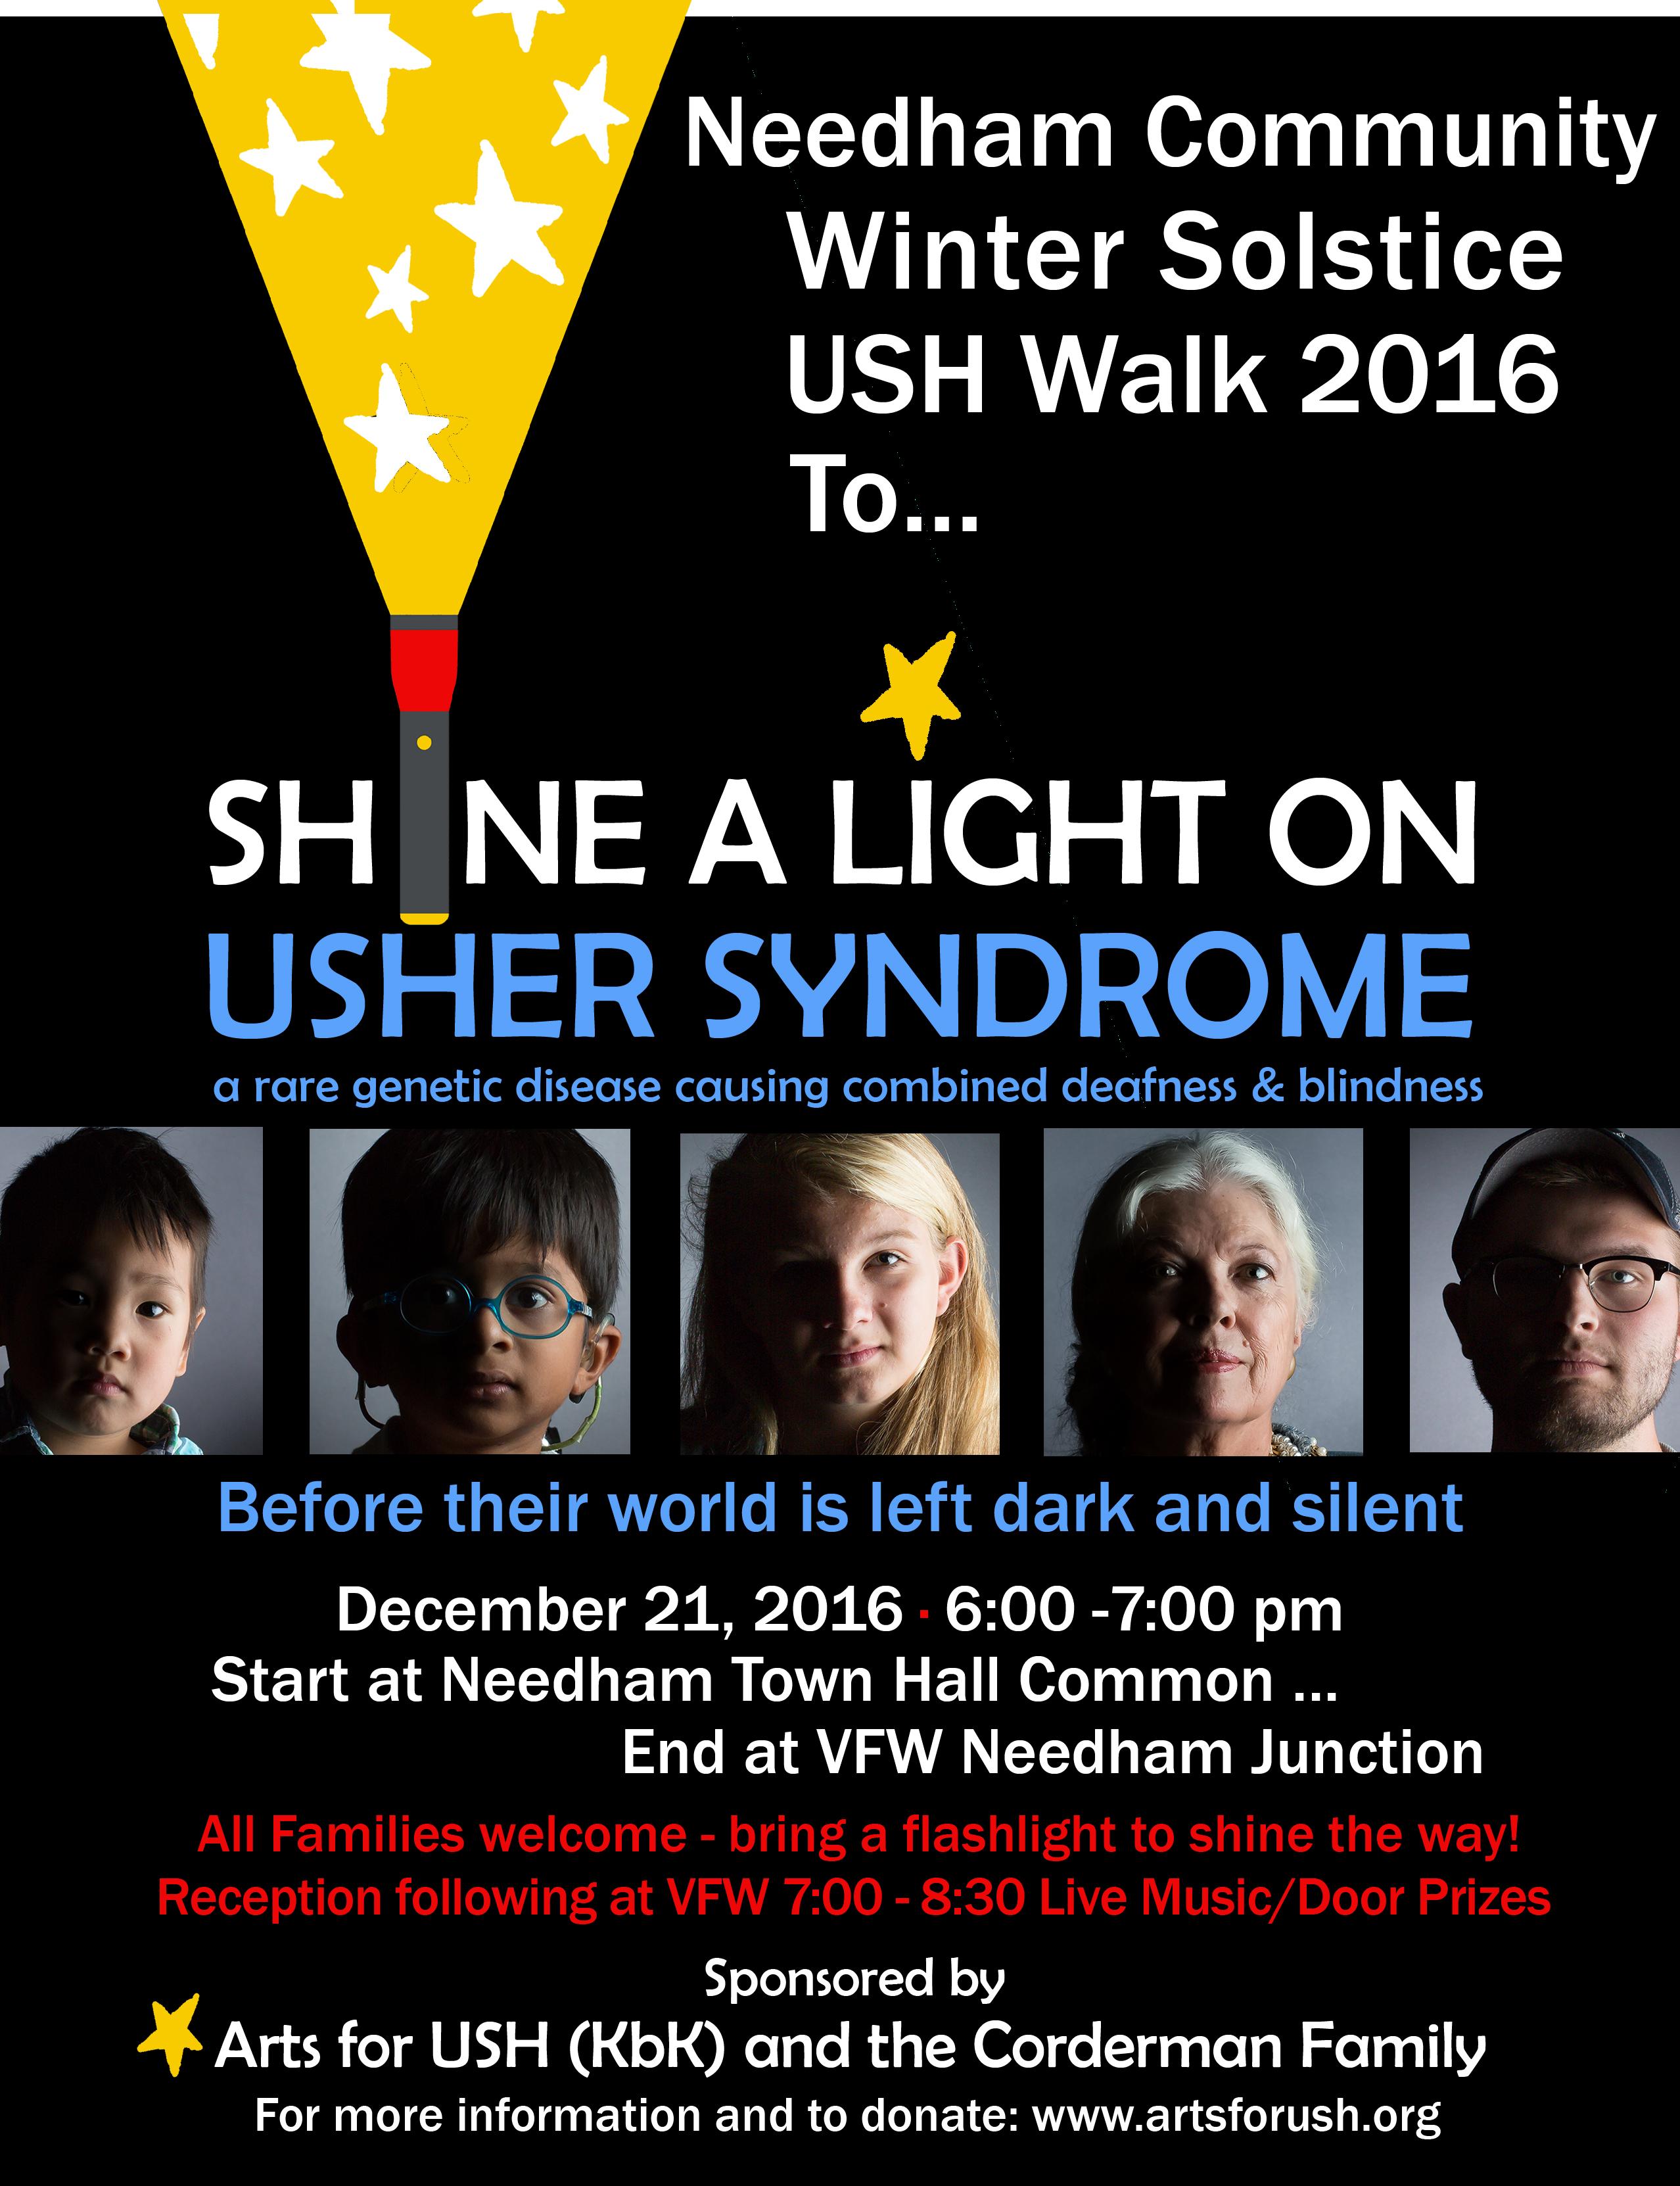 Winter Solstice USH Walk 2016